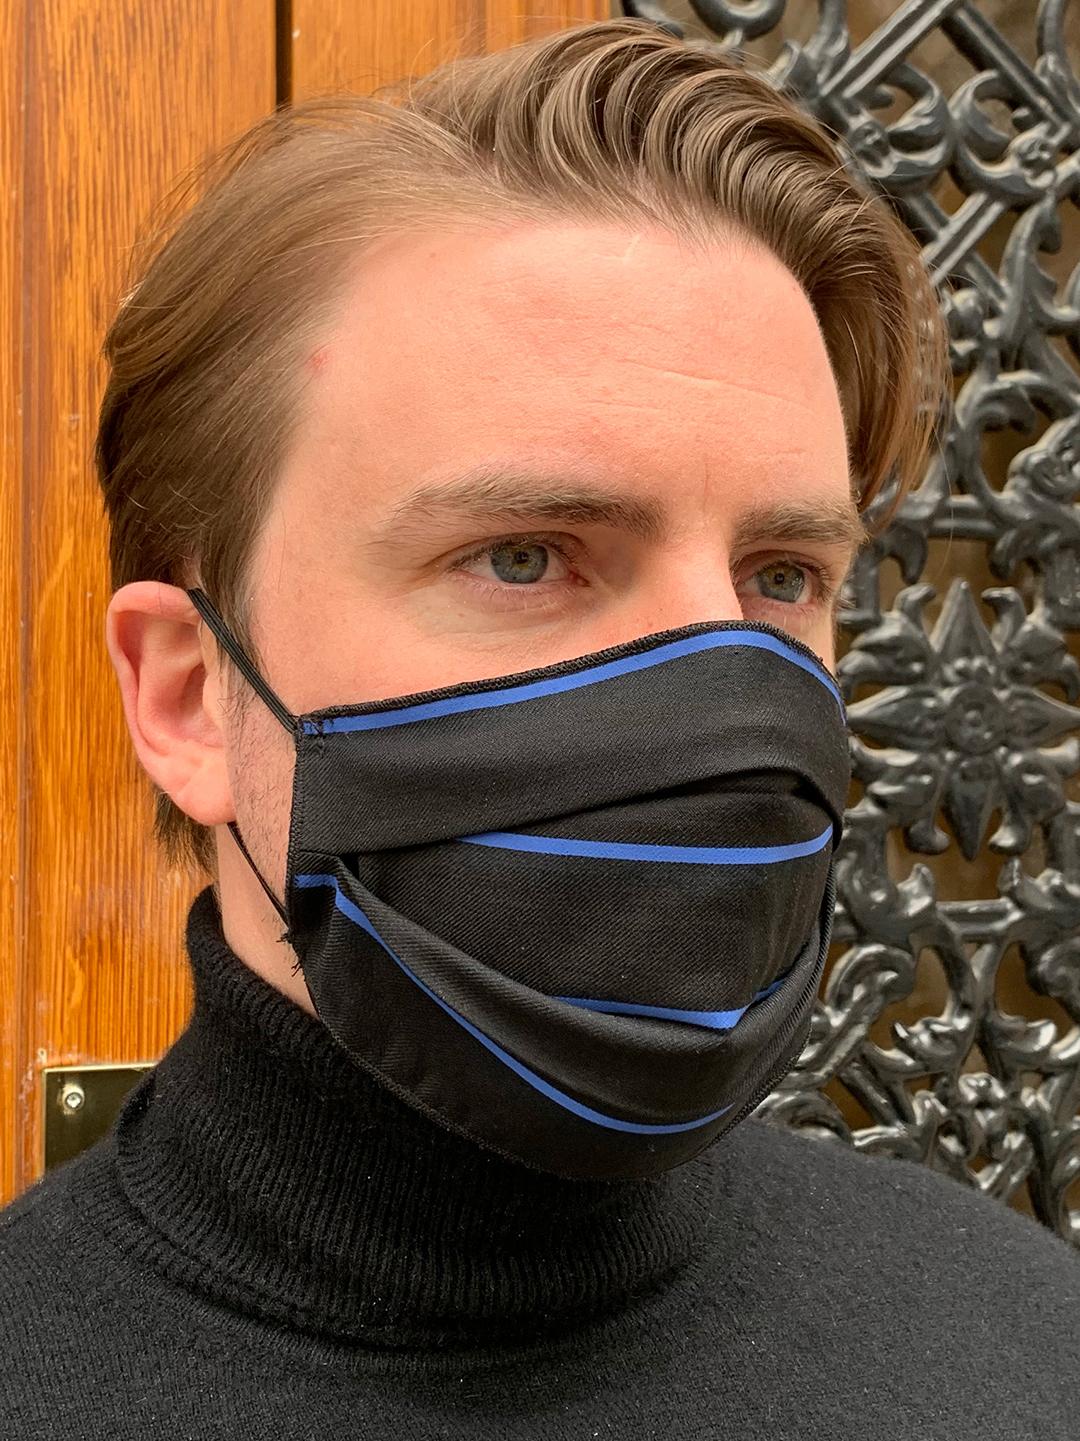 Masque de Protection Noir Rayé Bleu homme